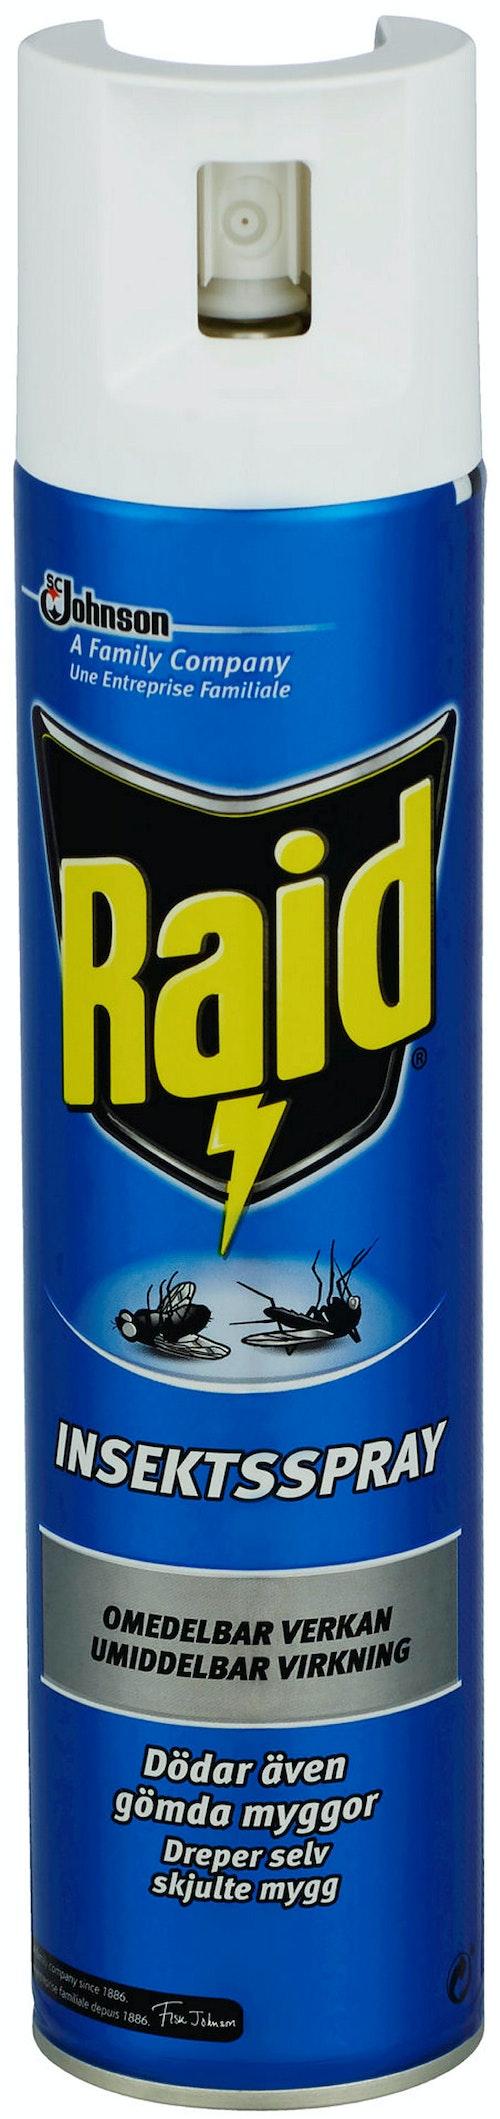 Raid Insektsmiddel Spray 300 ml